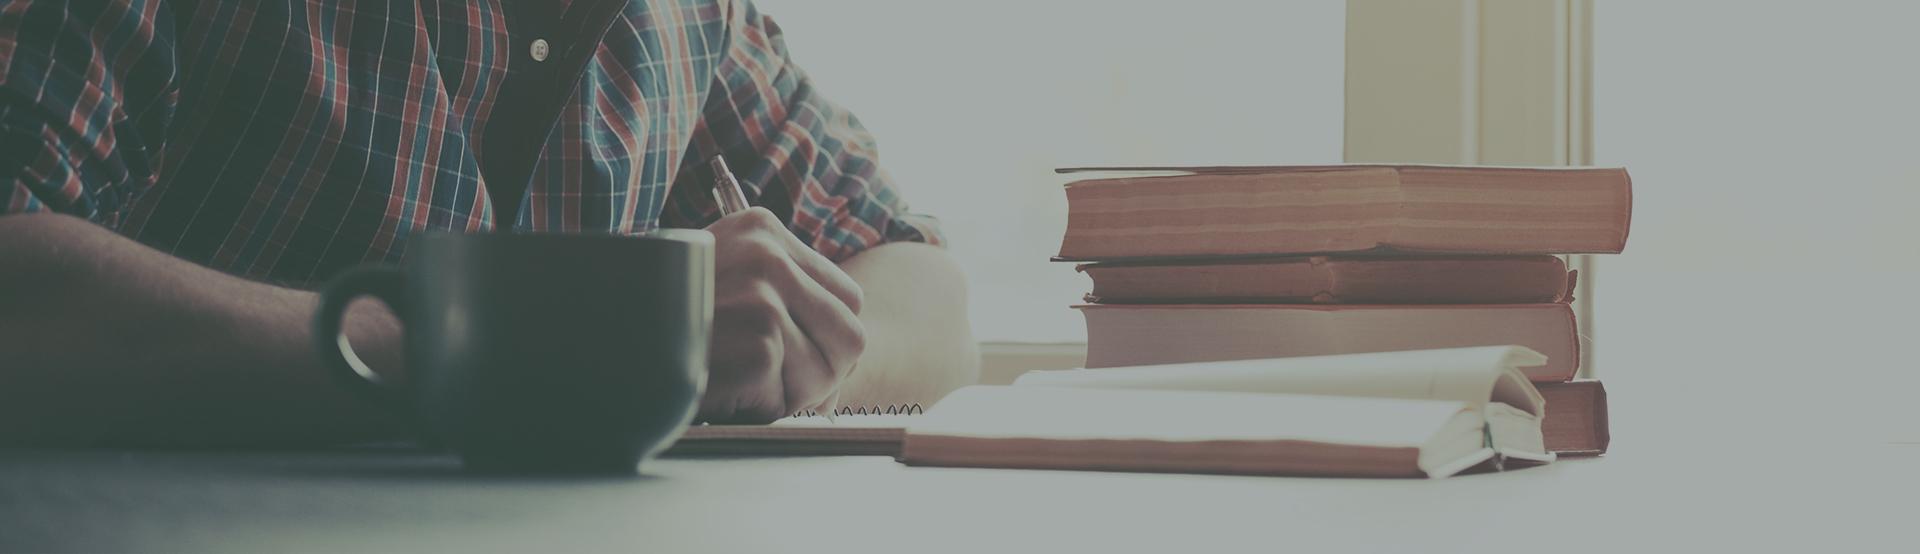 write-the-author